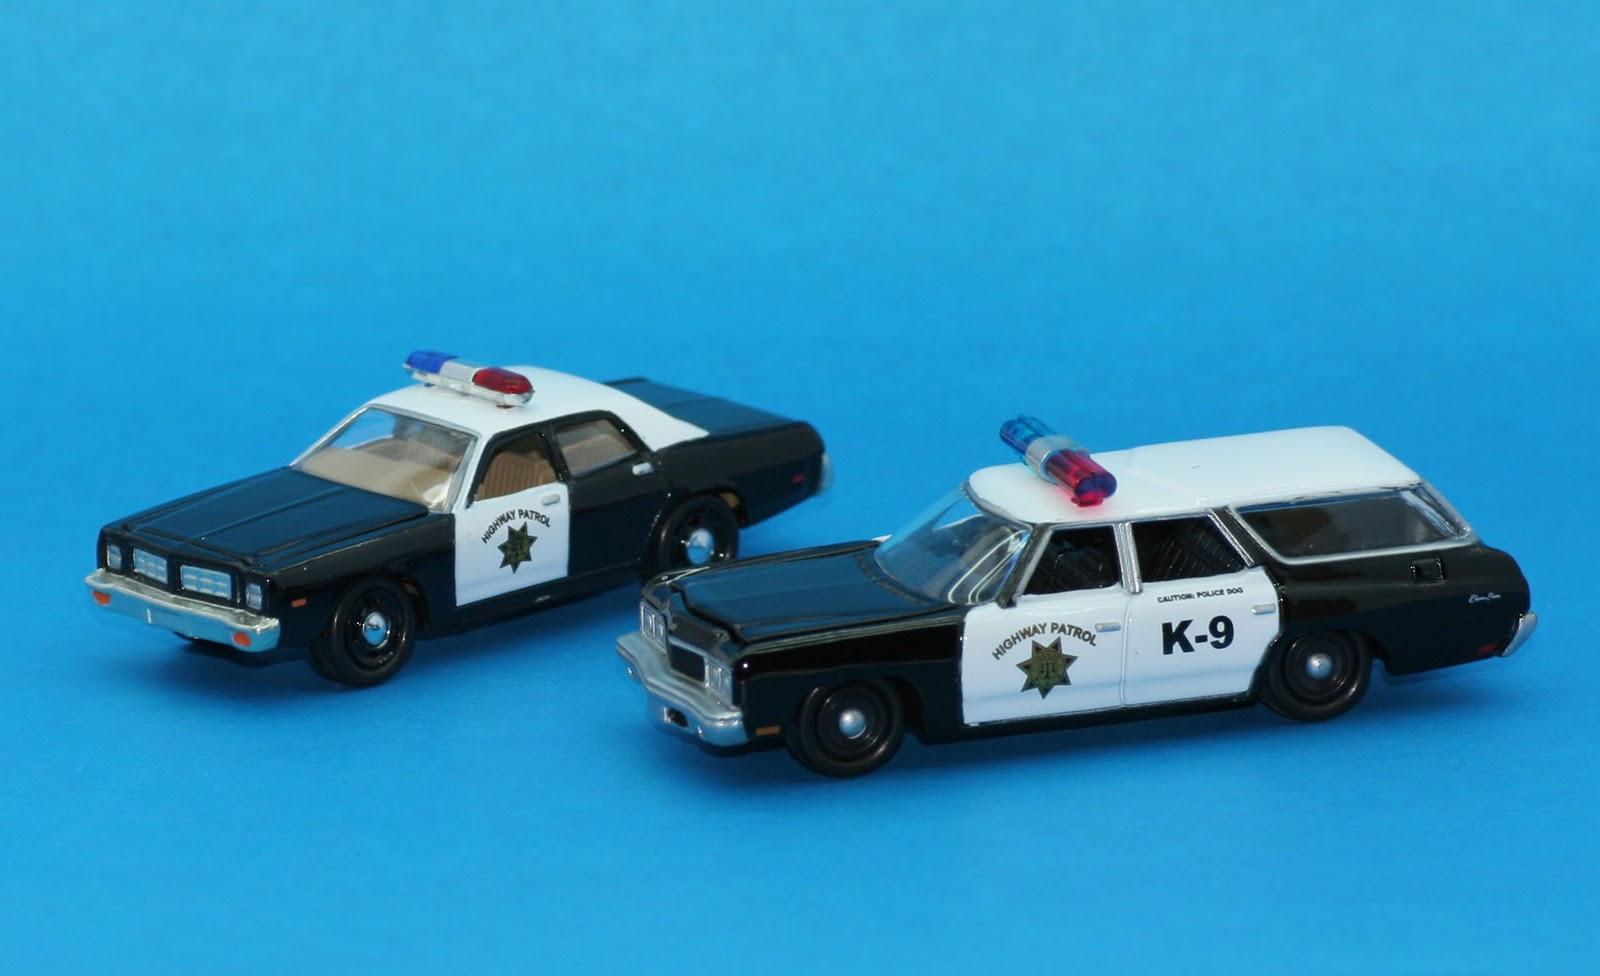 Incredible Mini Garage Chevrolet Caprice Wagon 1973 K 9 Highway Patrol 1 64 Johnny Lightning